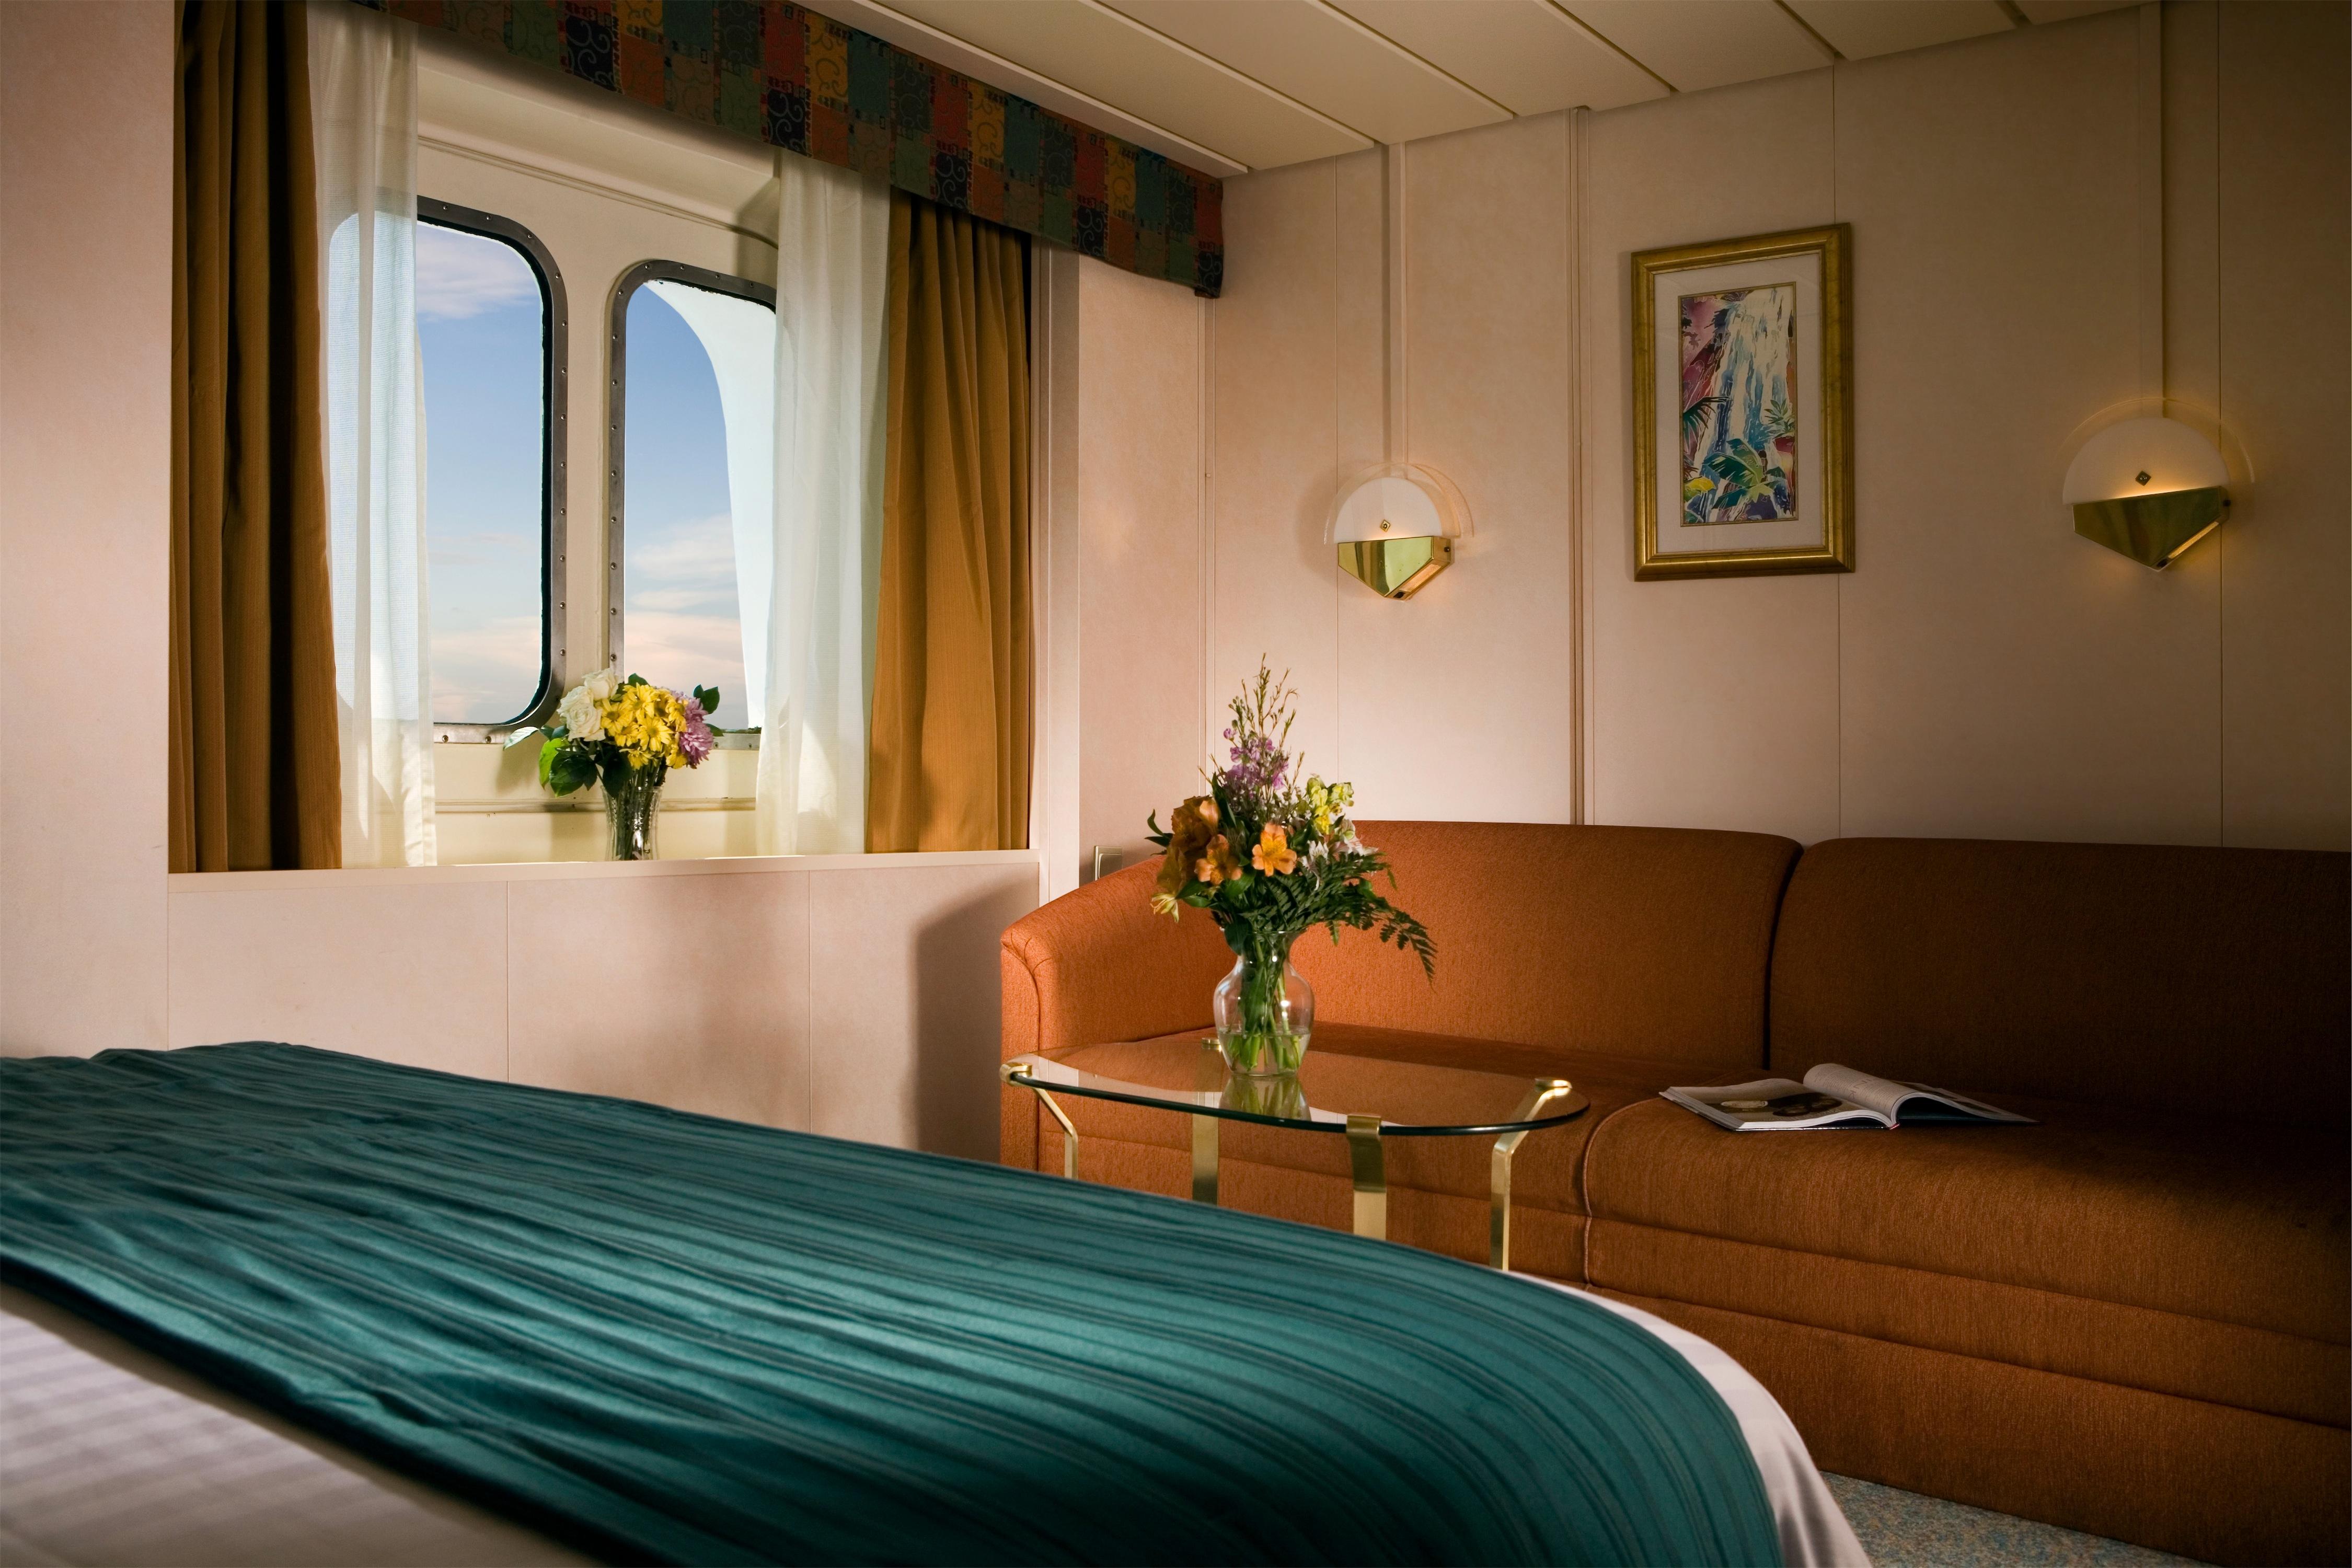 Royal Caribbean International Rhapsody of the Seas Accommodation Ocean View Stateroom 2.jpg